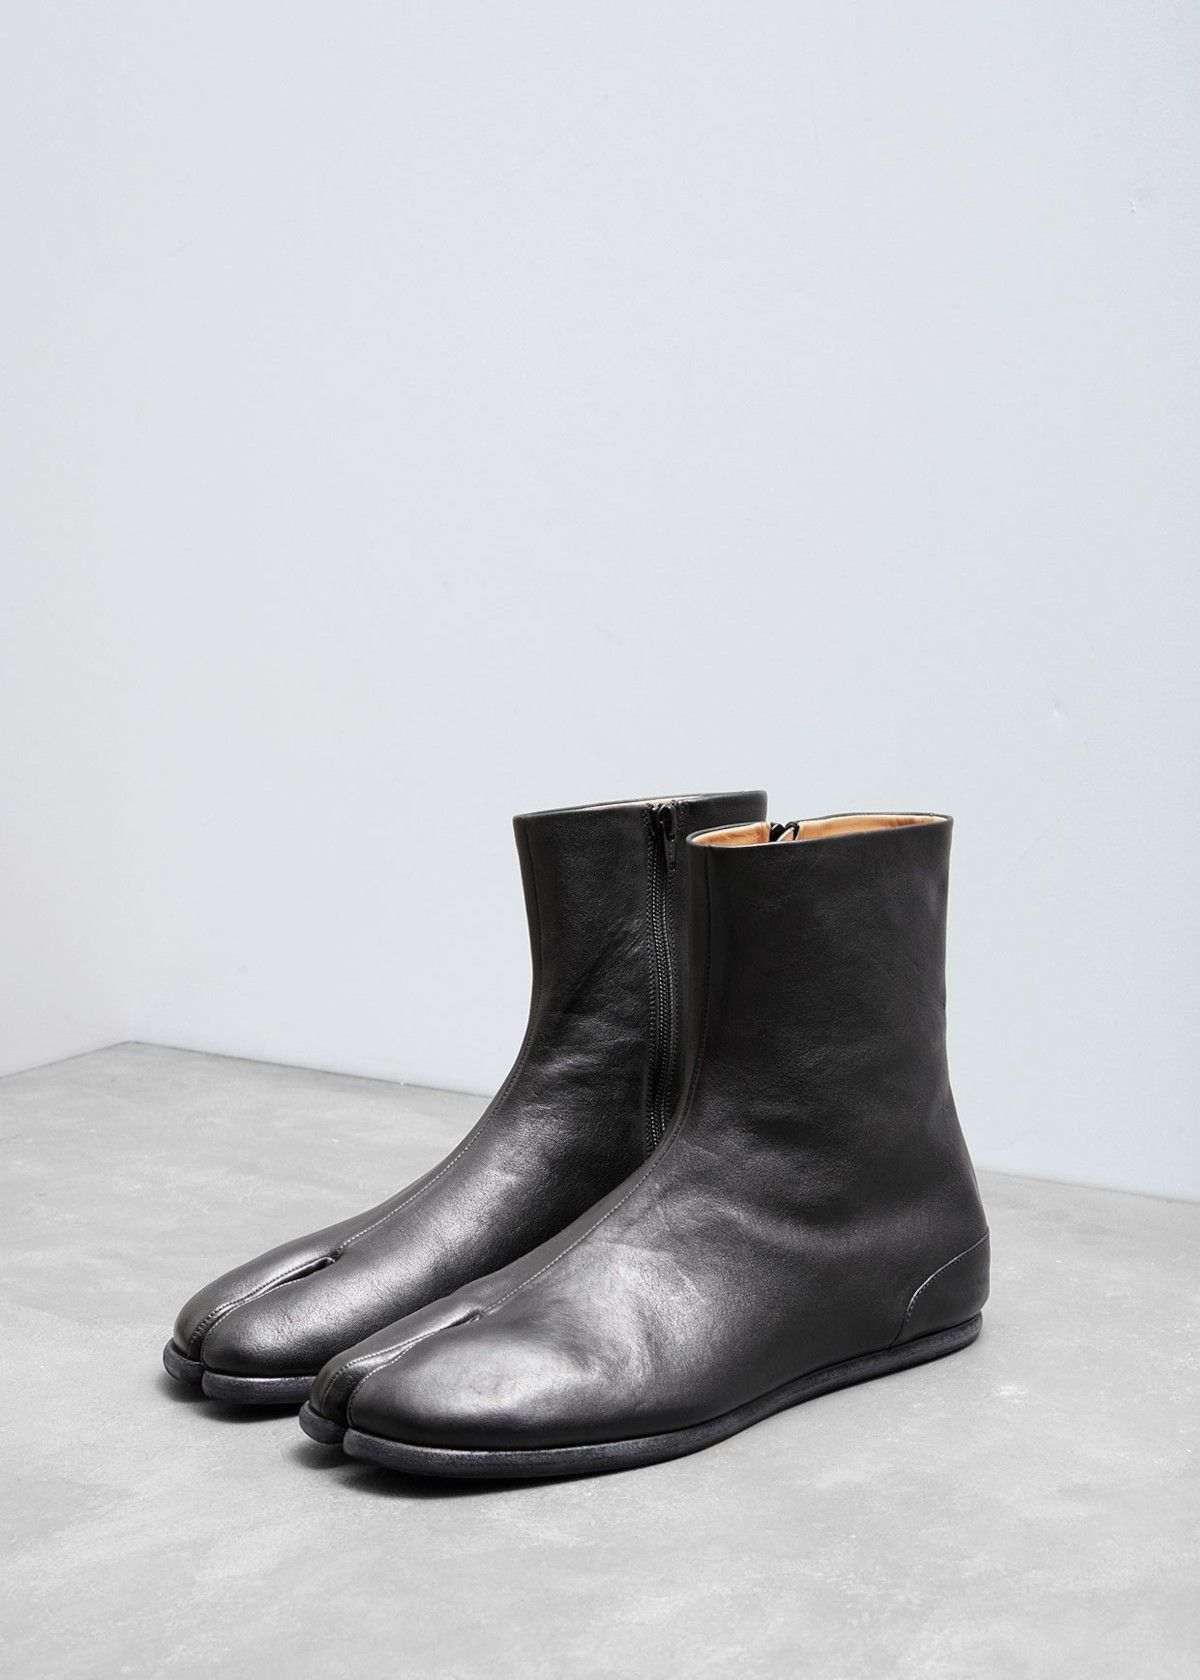 Maison Margiela - Tabi Boots // | Best